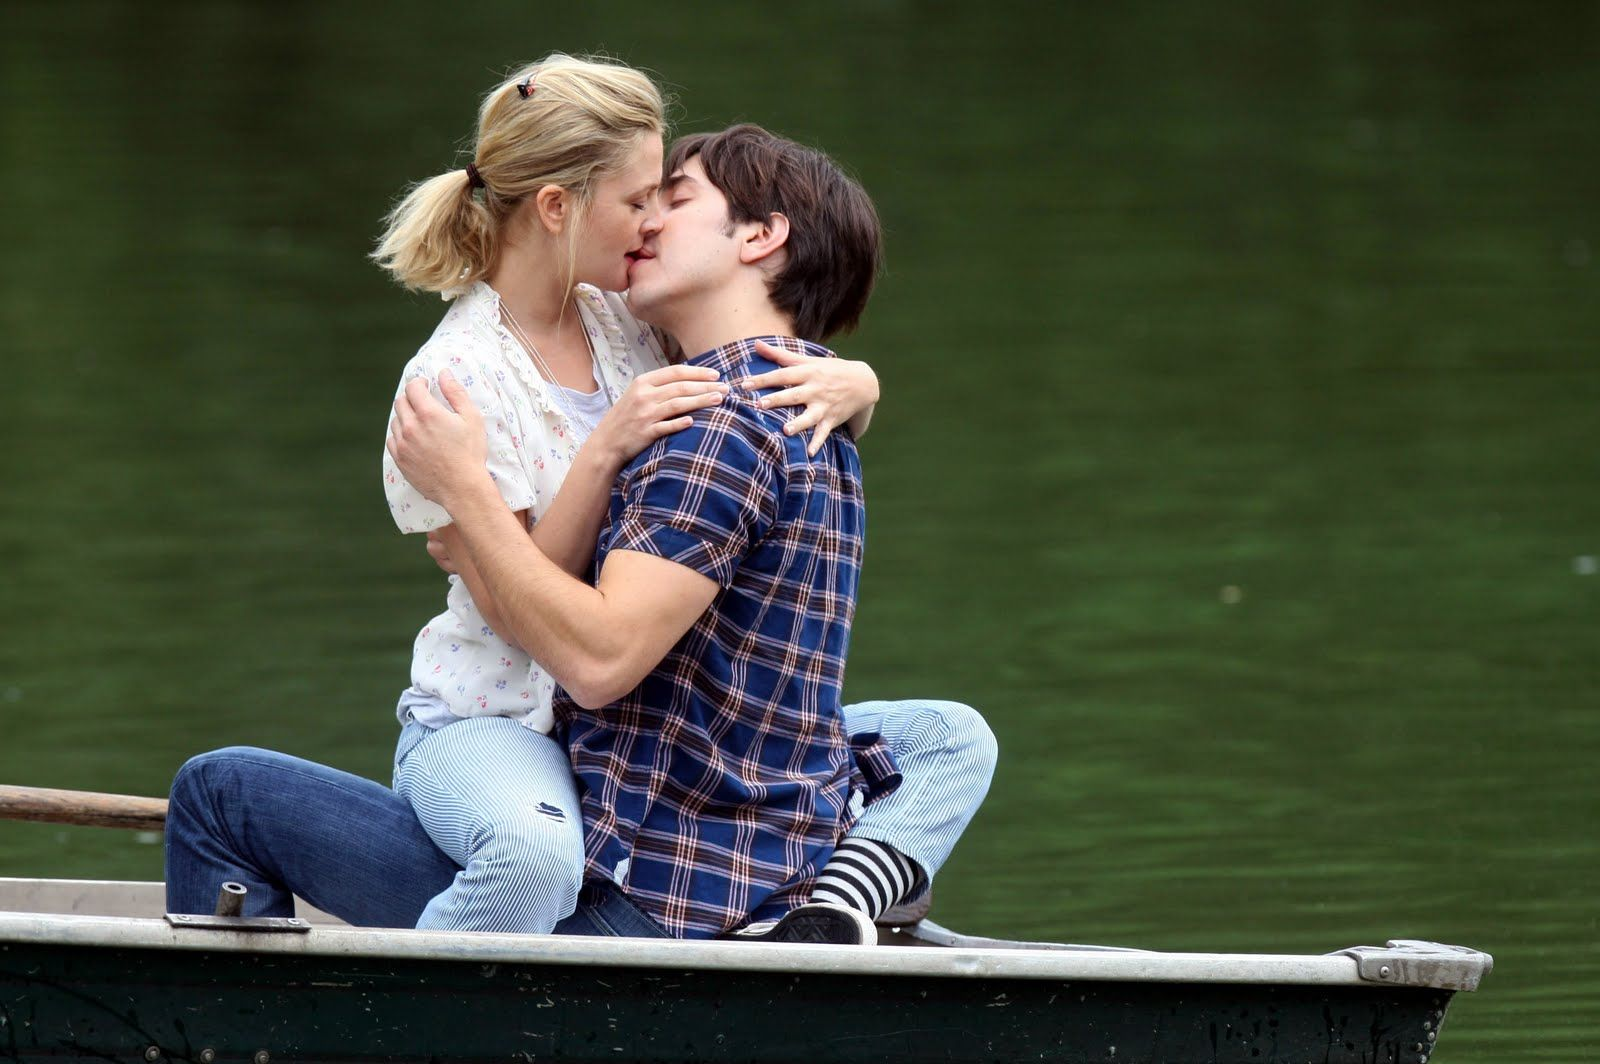 Romantic Couple Kissing Romantic Love Couples Kissing